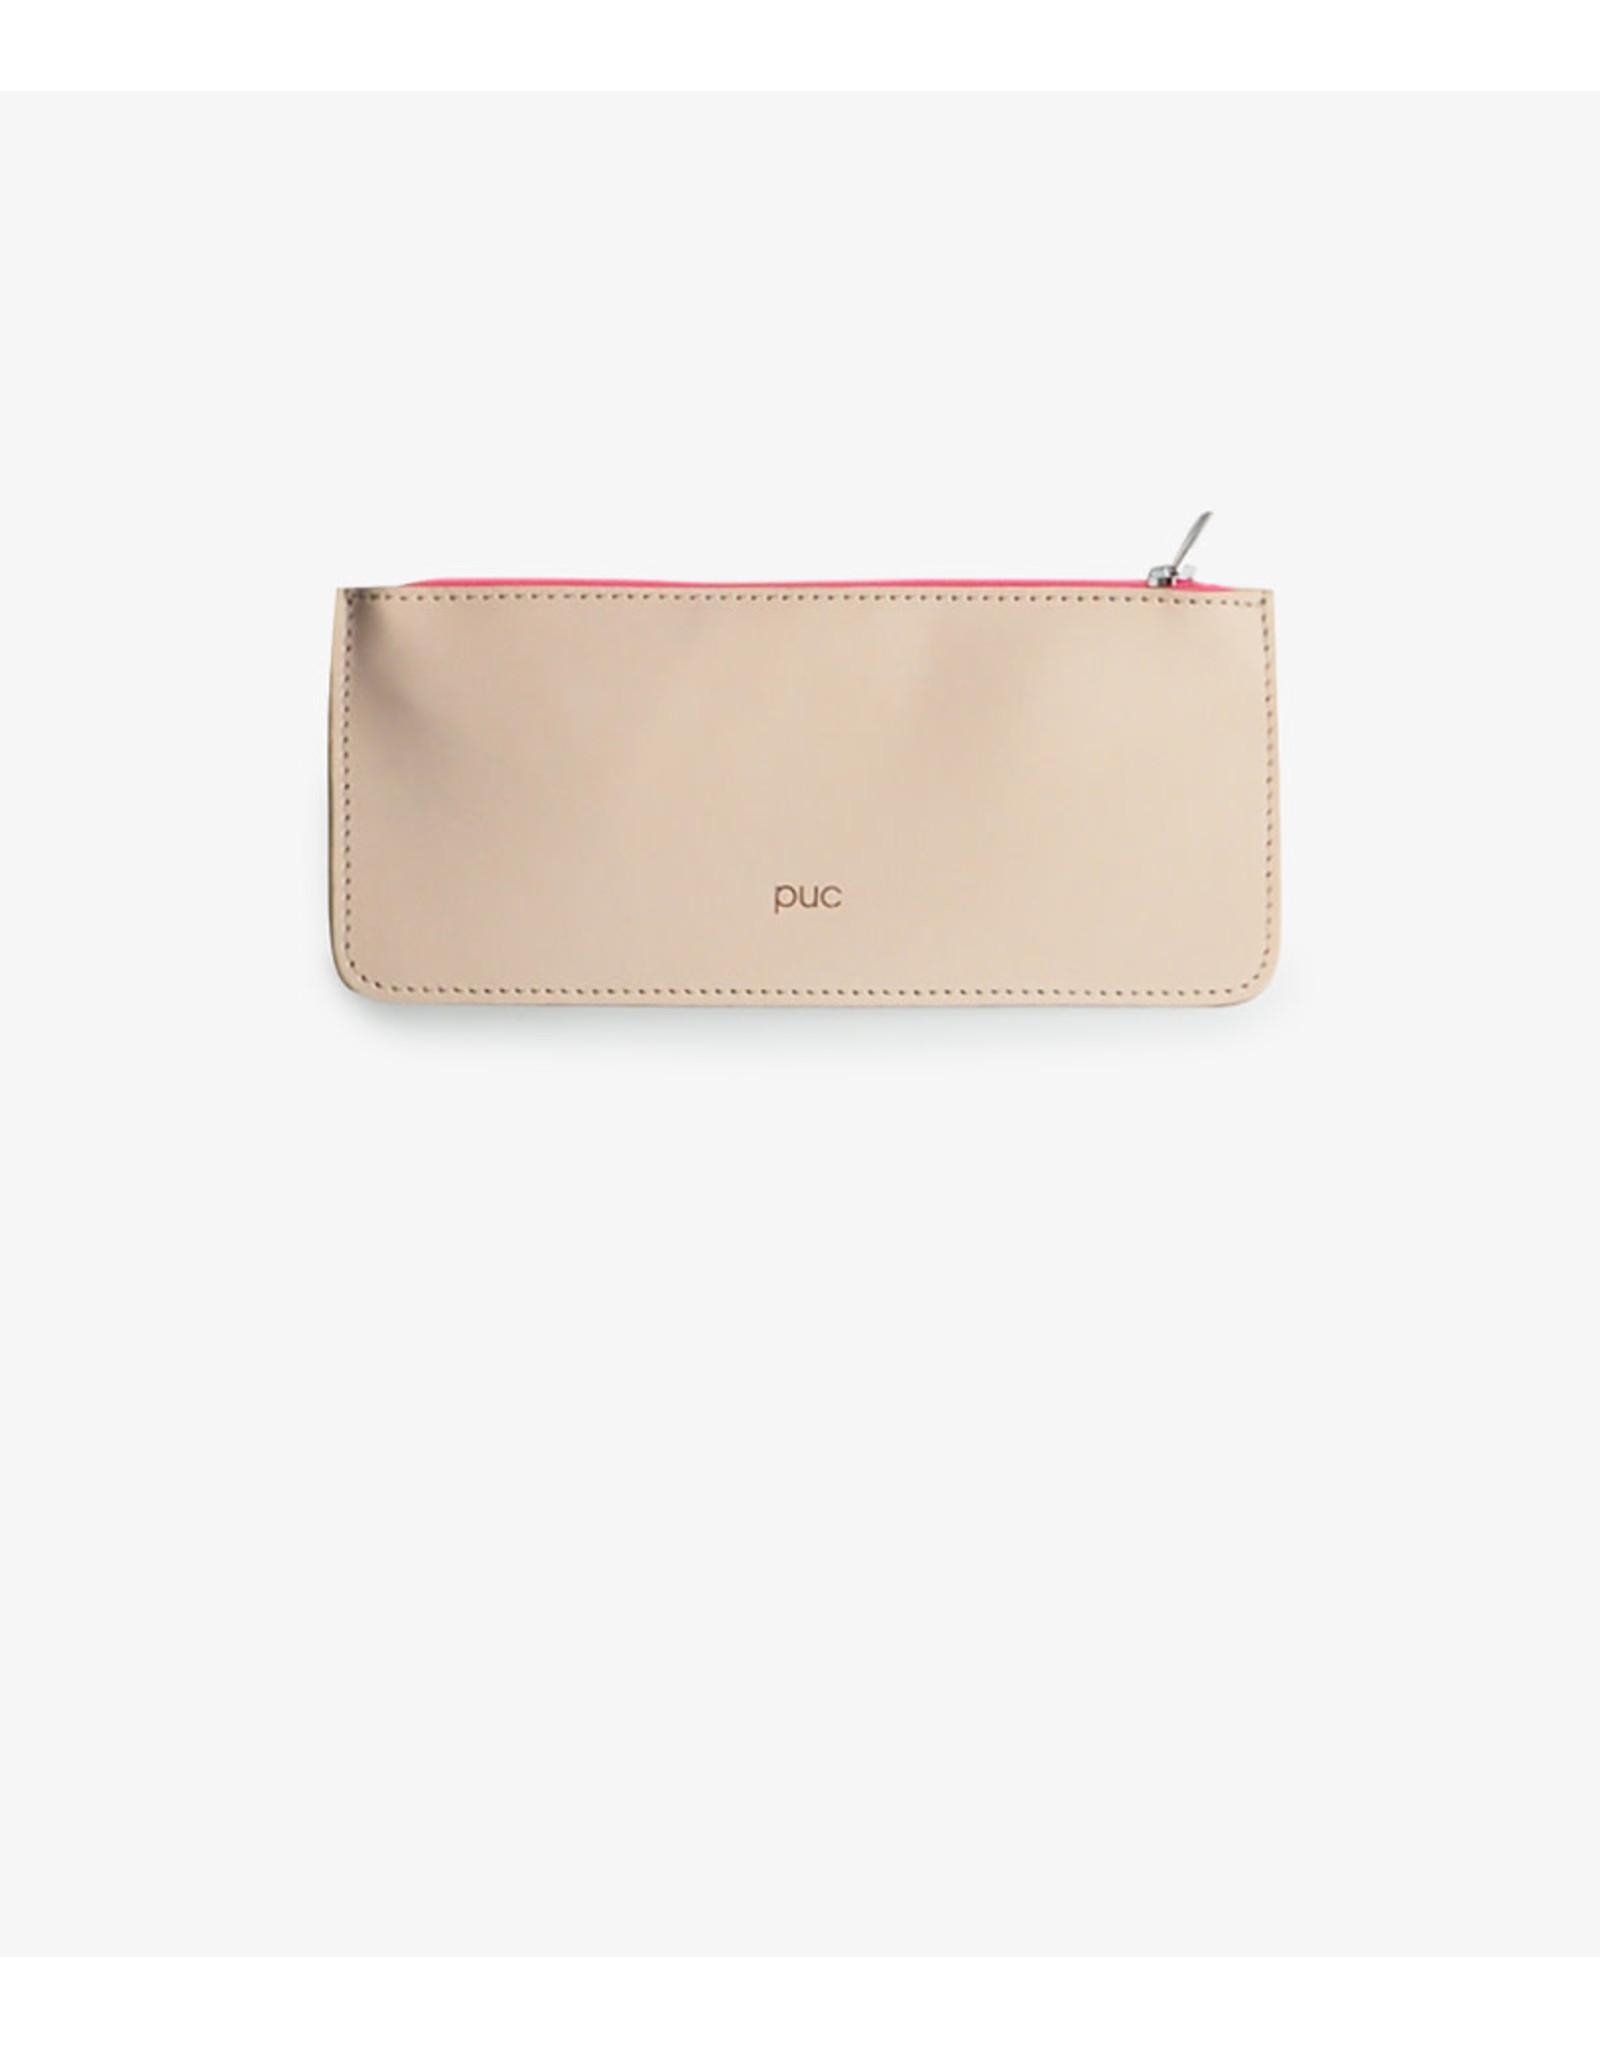 Puc Creative   Nude   Fluor pink   19 x 8,5 cm